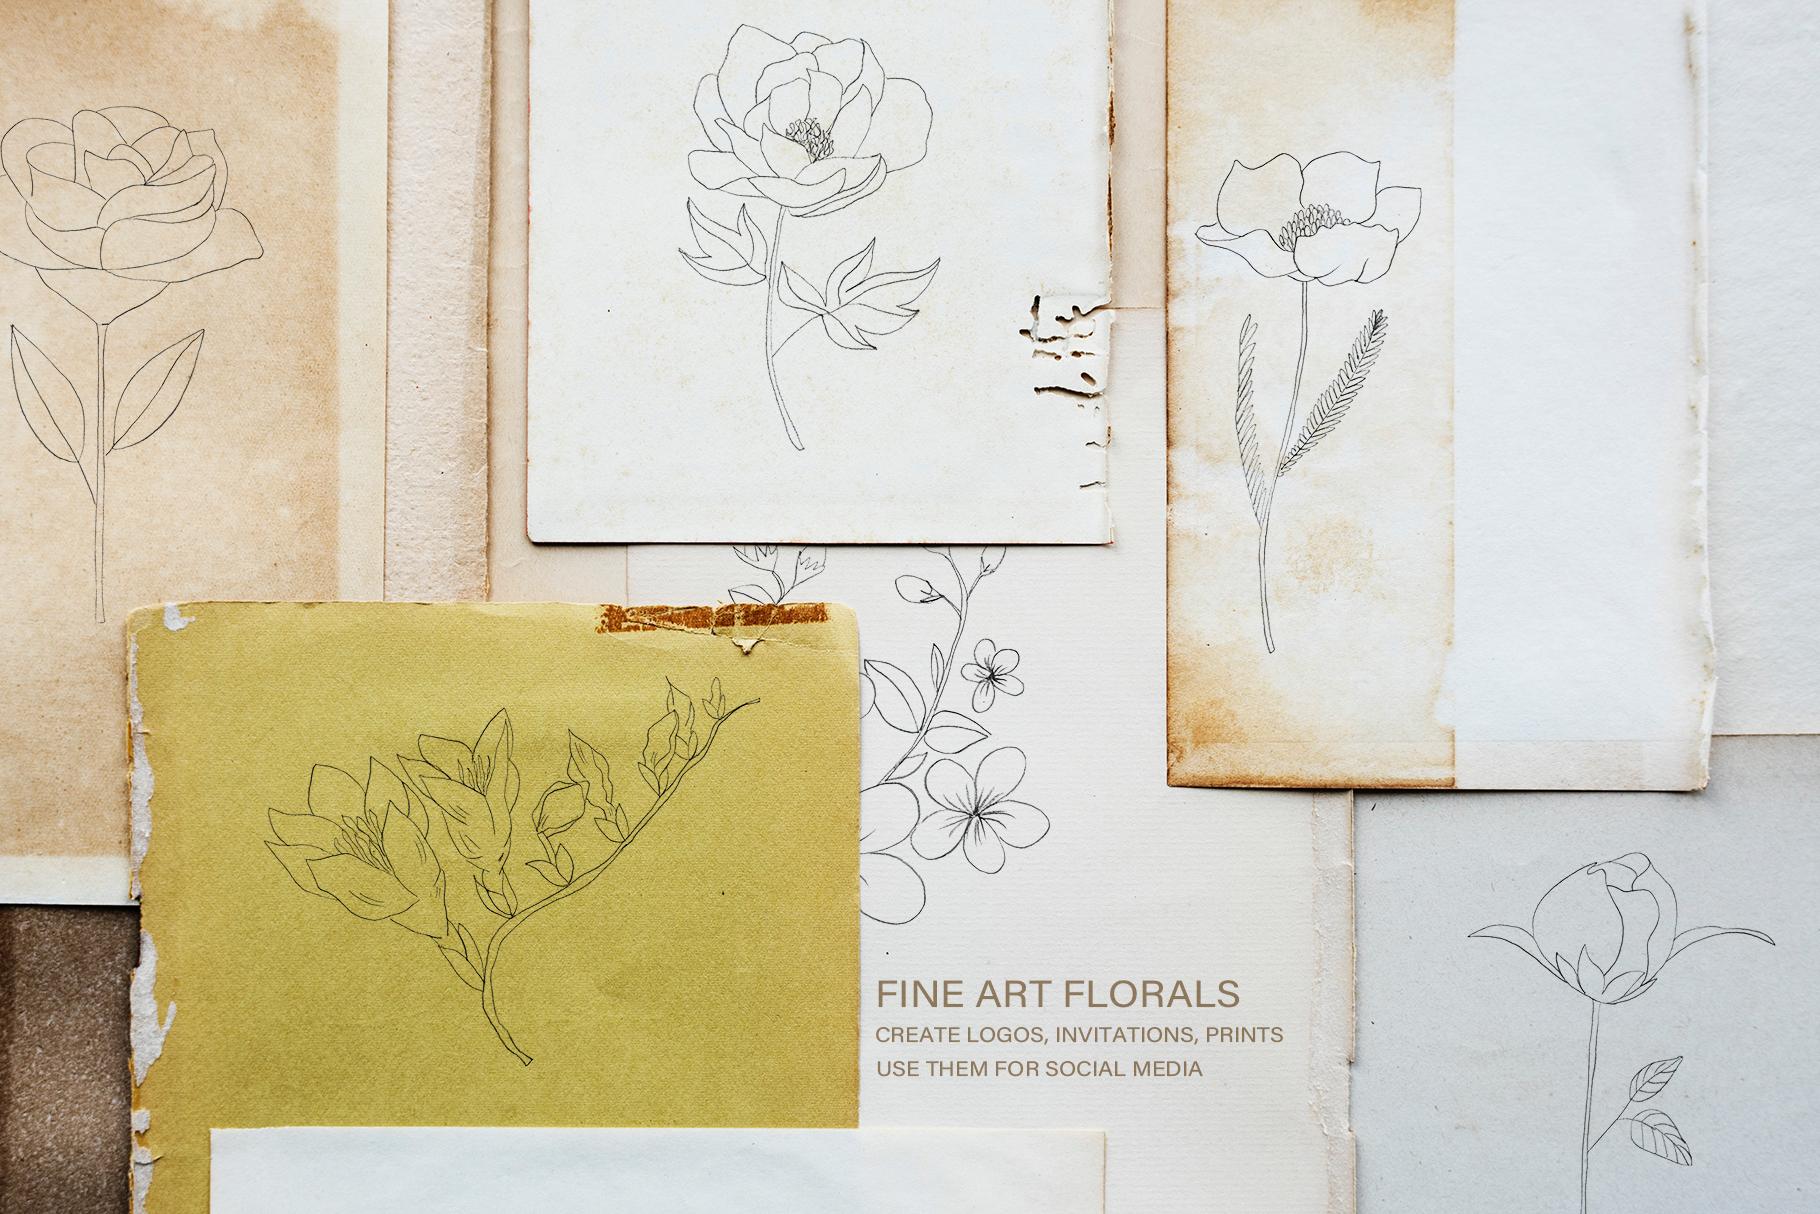 Fine Art Florals - Pencil Sketches example image 2